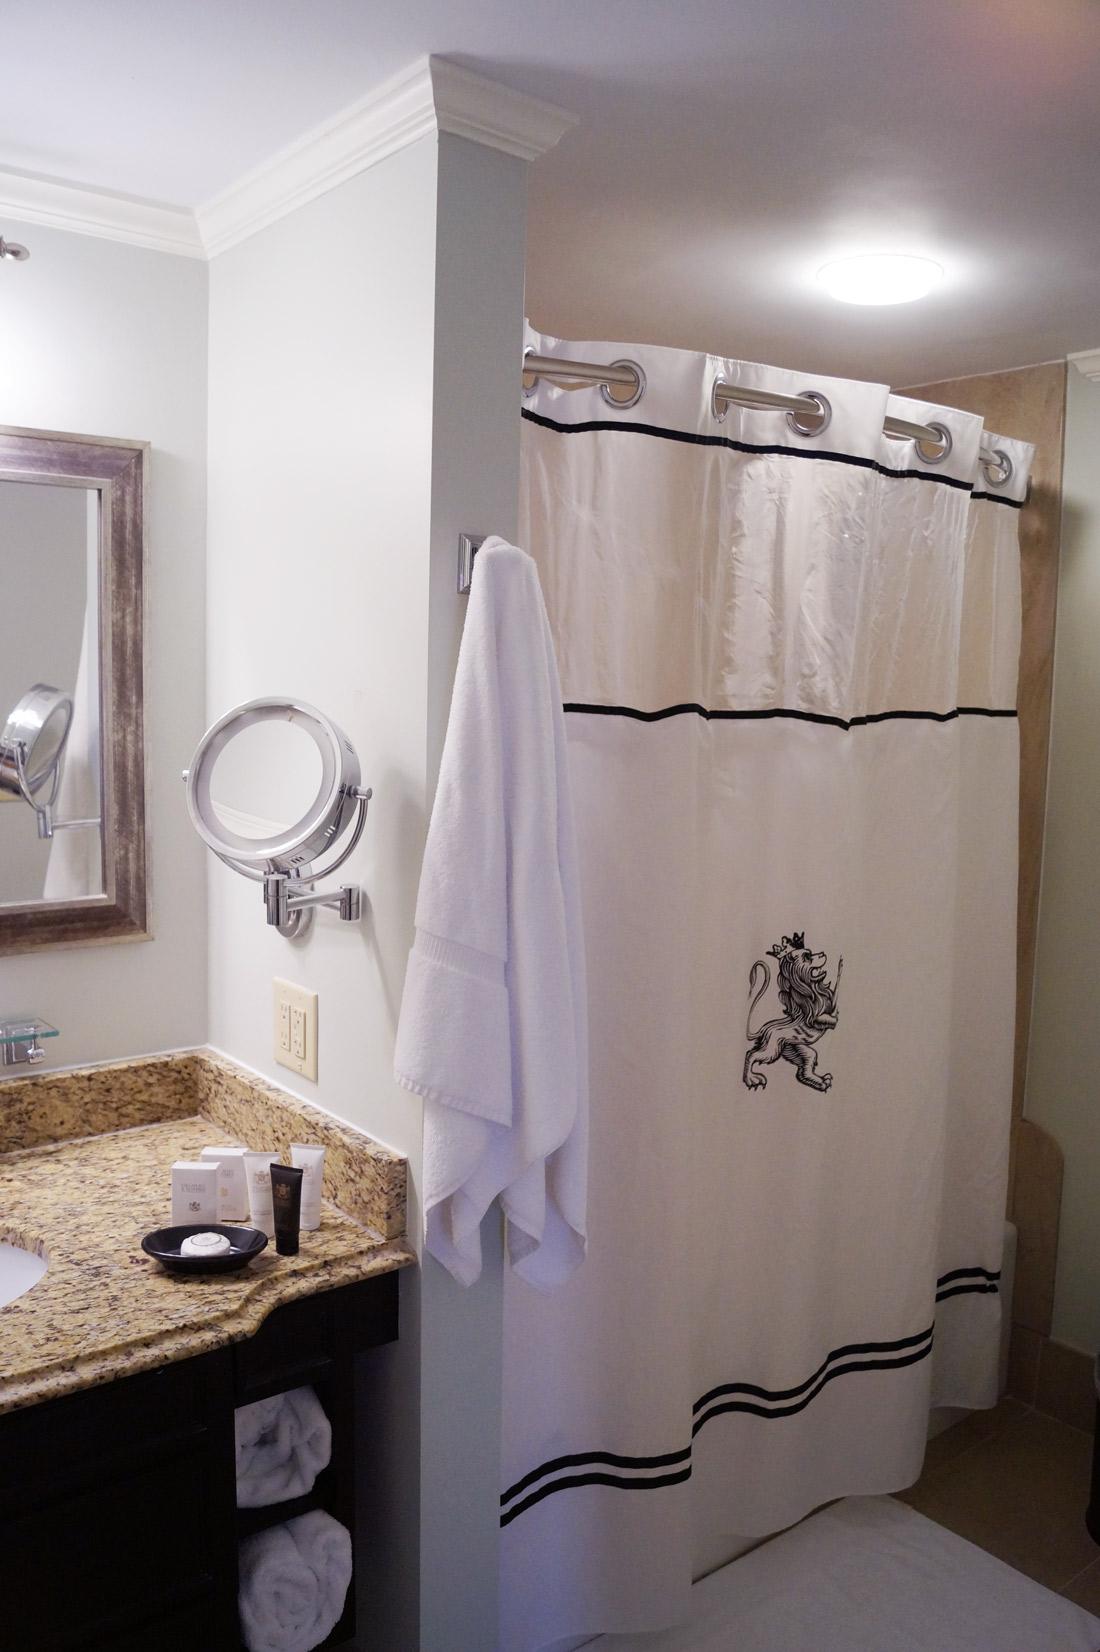 Bag-at-you---Travel-blog---King-Charles-Inn--bath-room